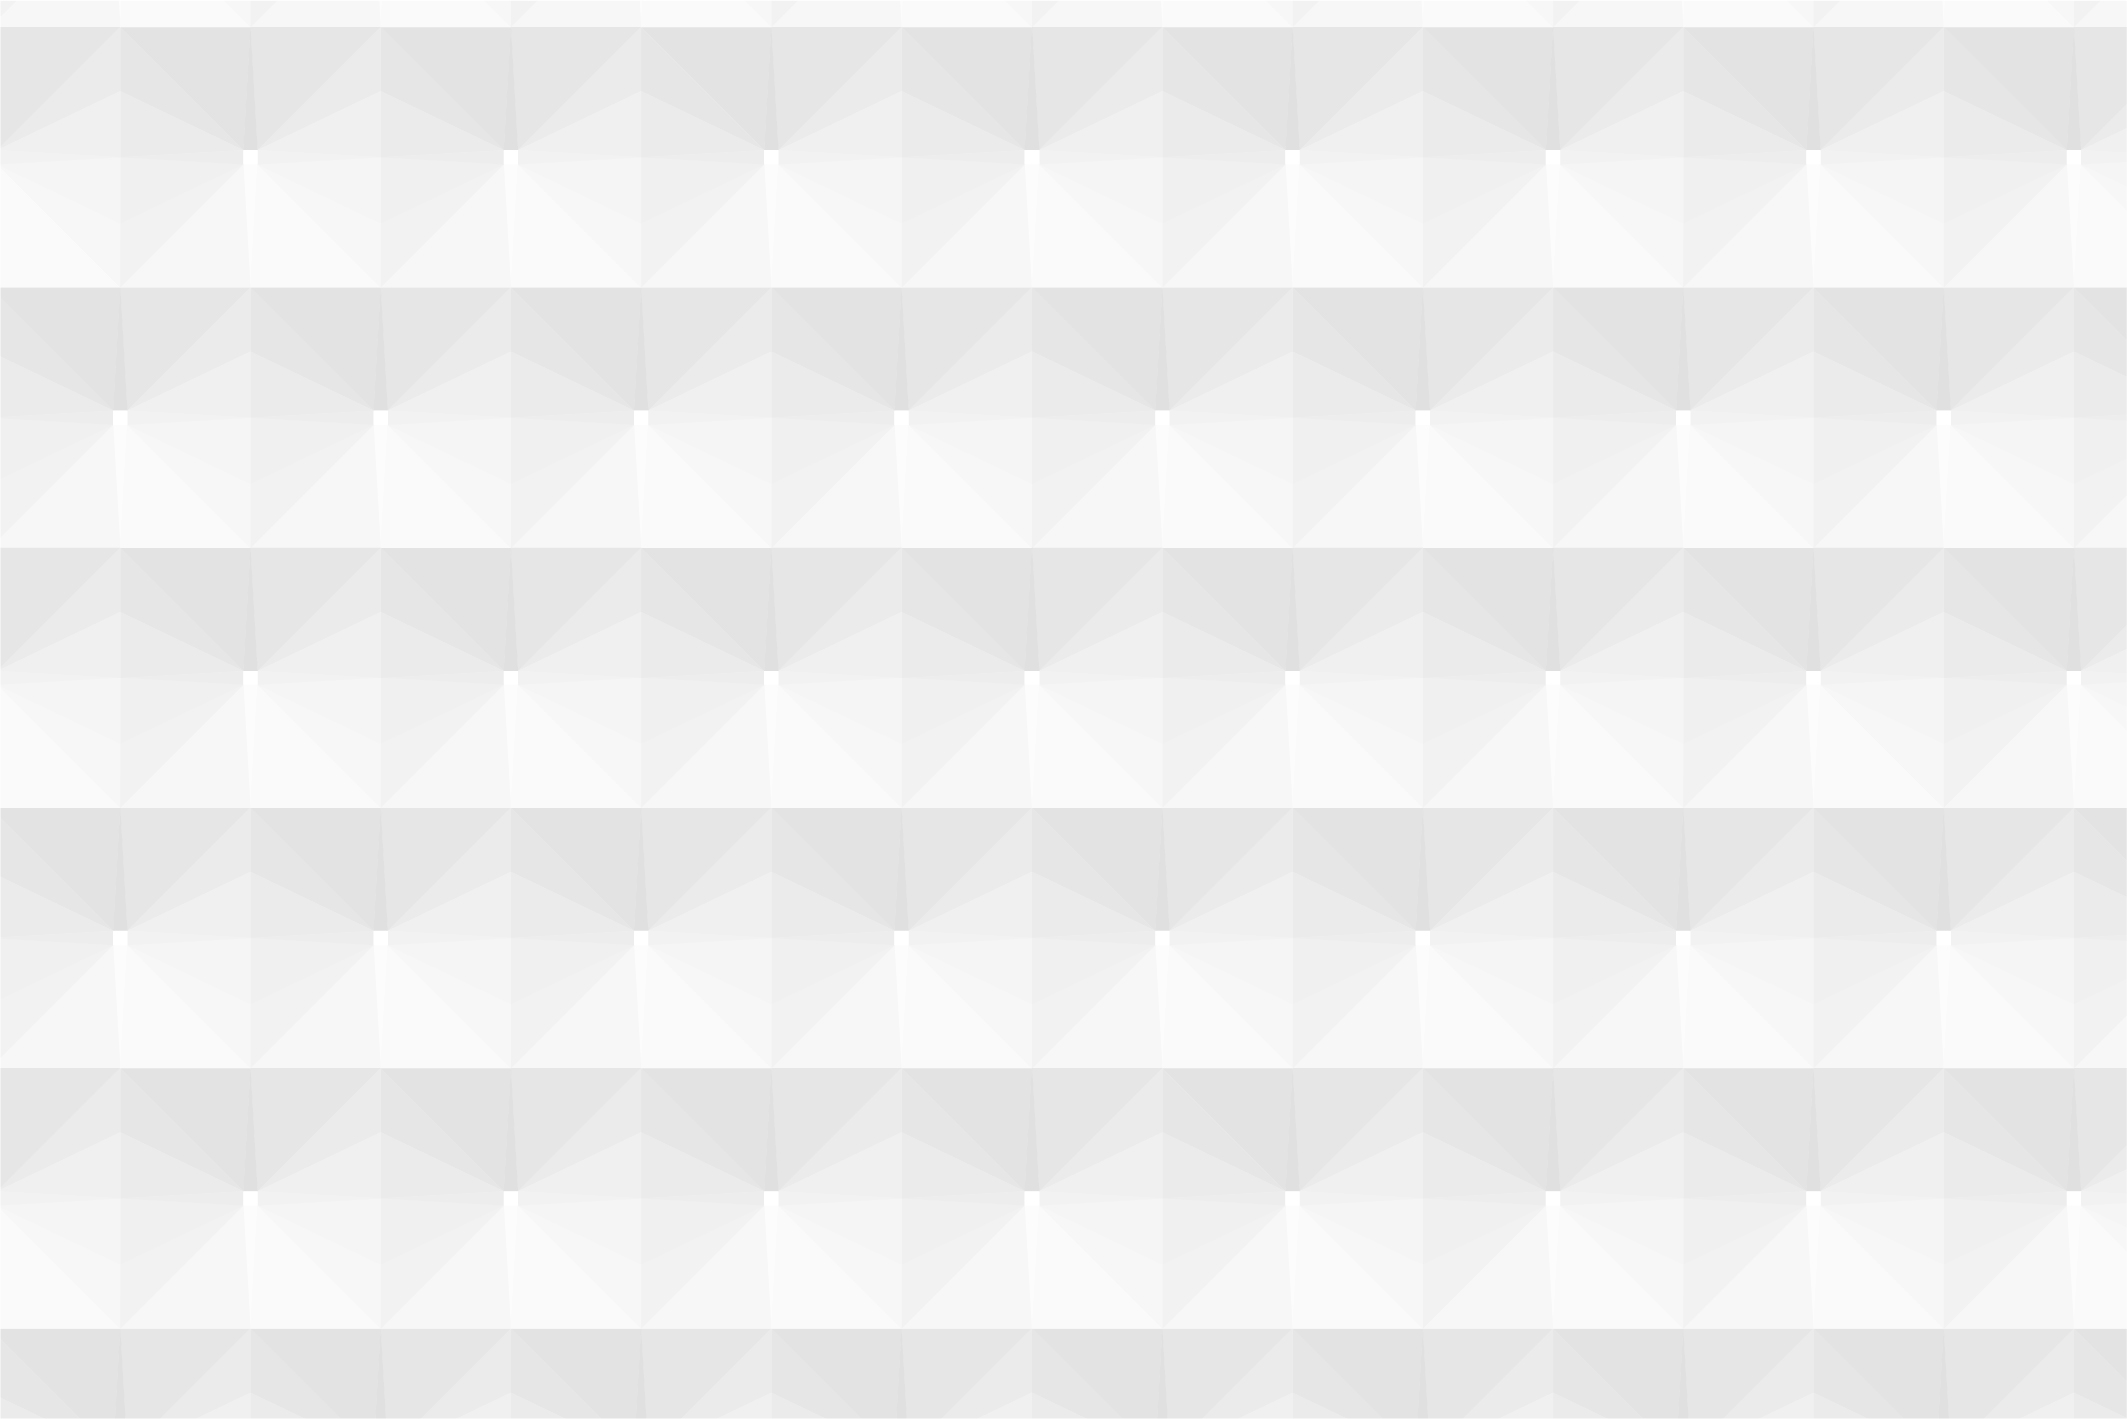 Geometric white 3d seamless textures example image 4